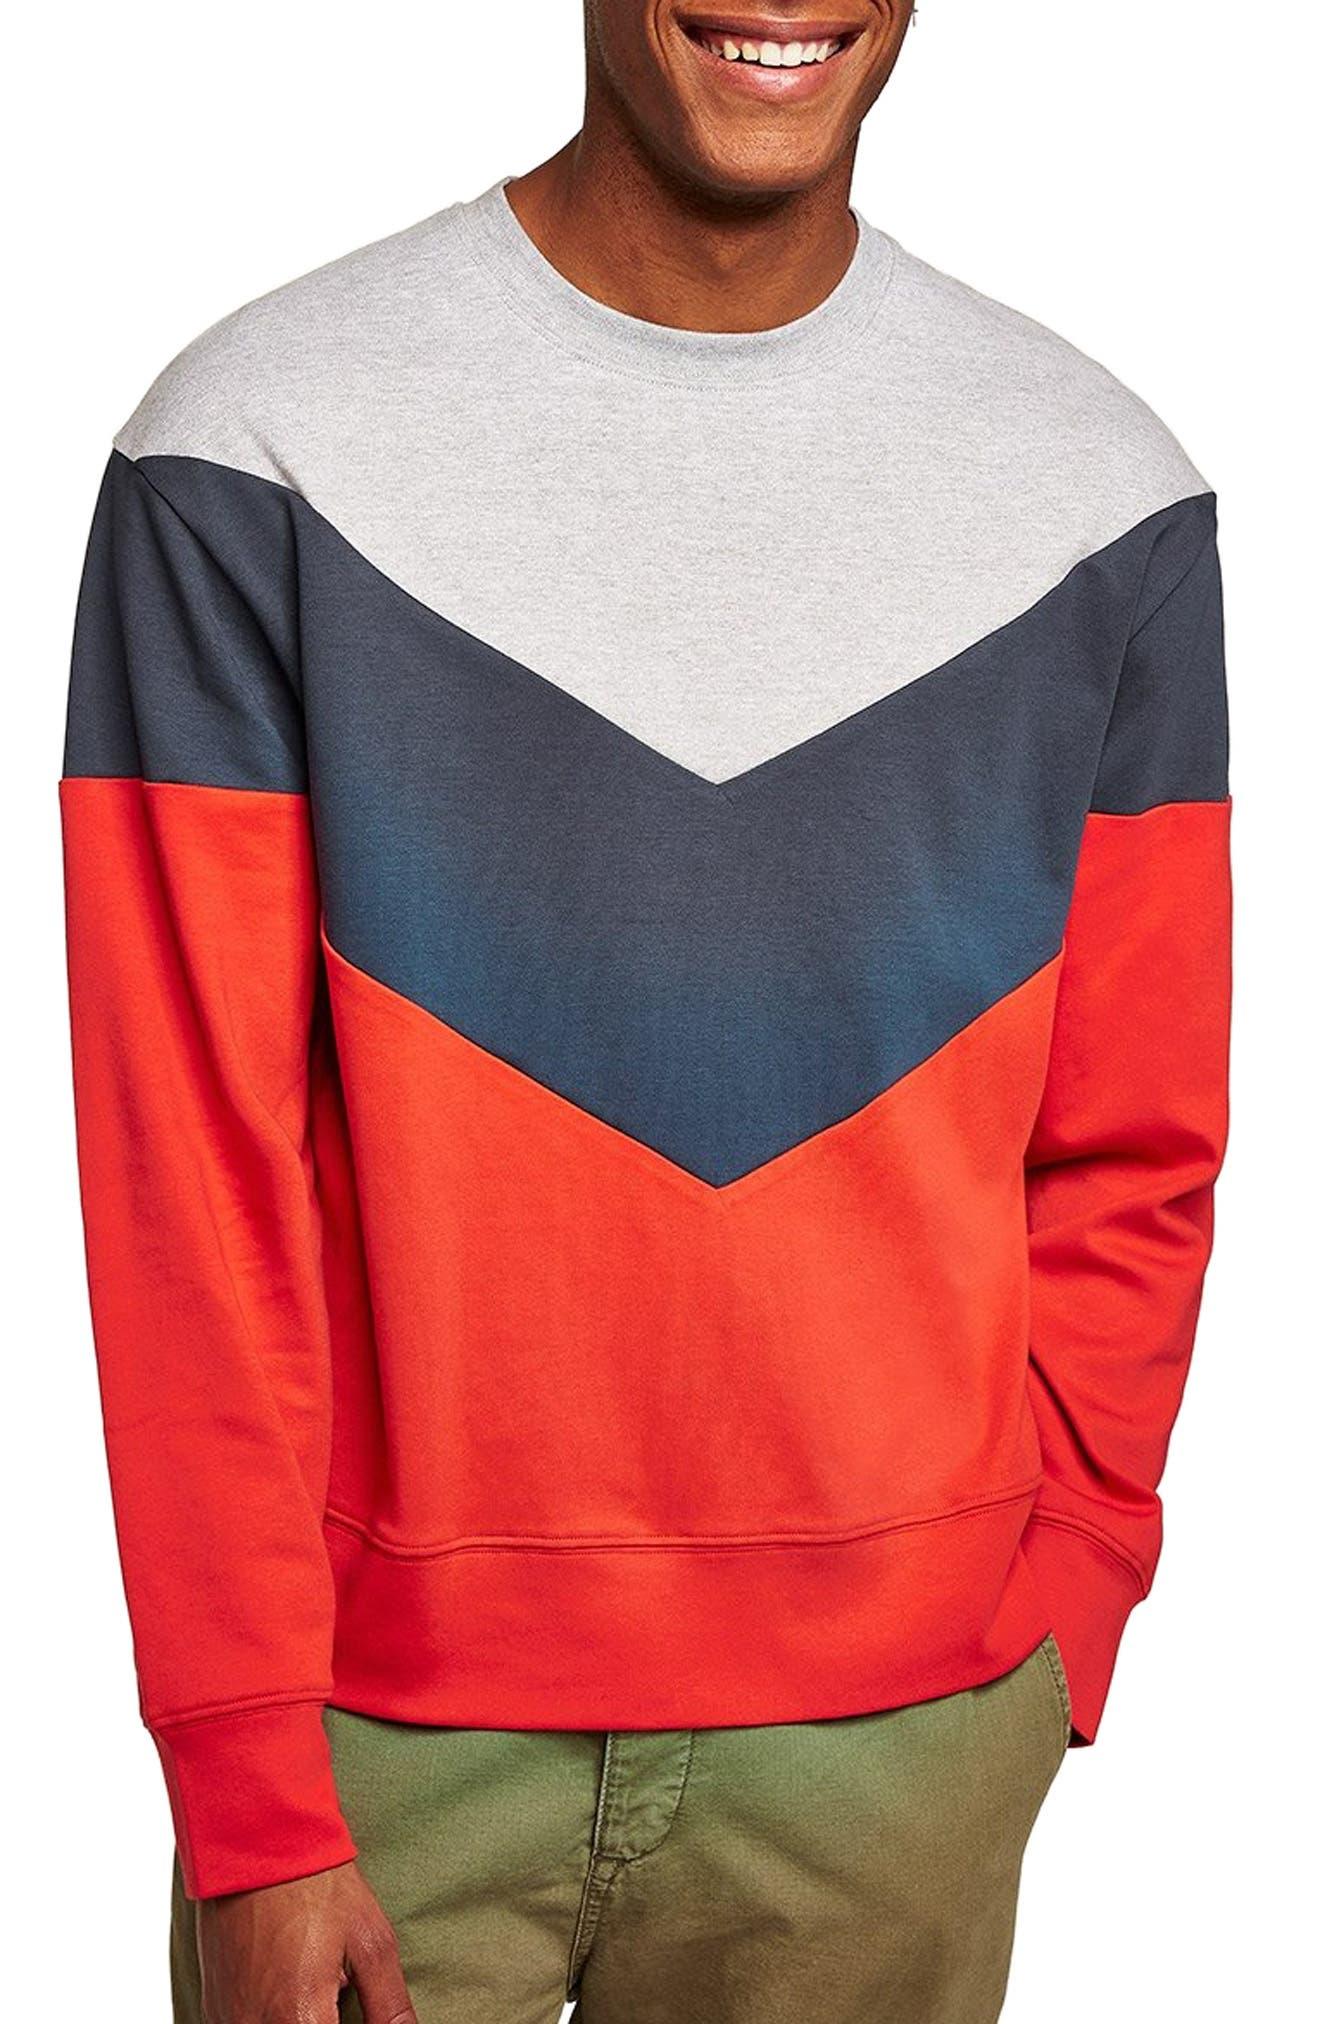 Chevron Colorblock Sweatshirt,                             Main thumbnail 1, color,                             RED MULTI